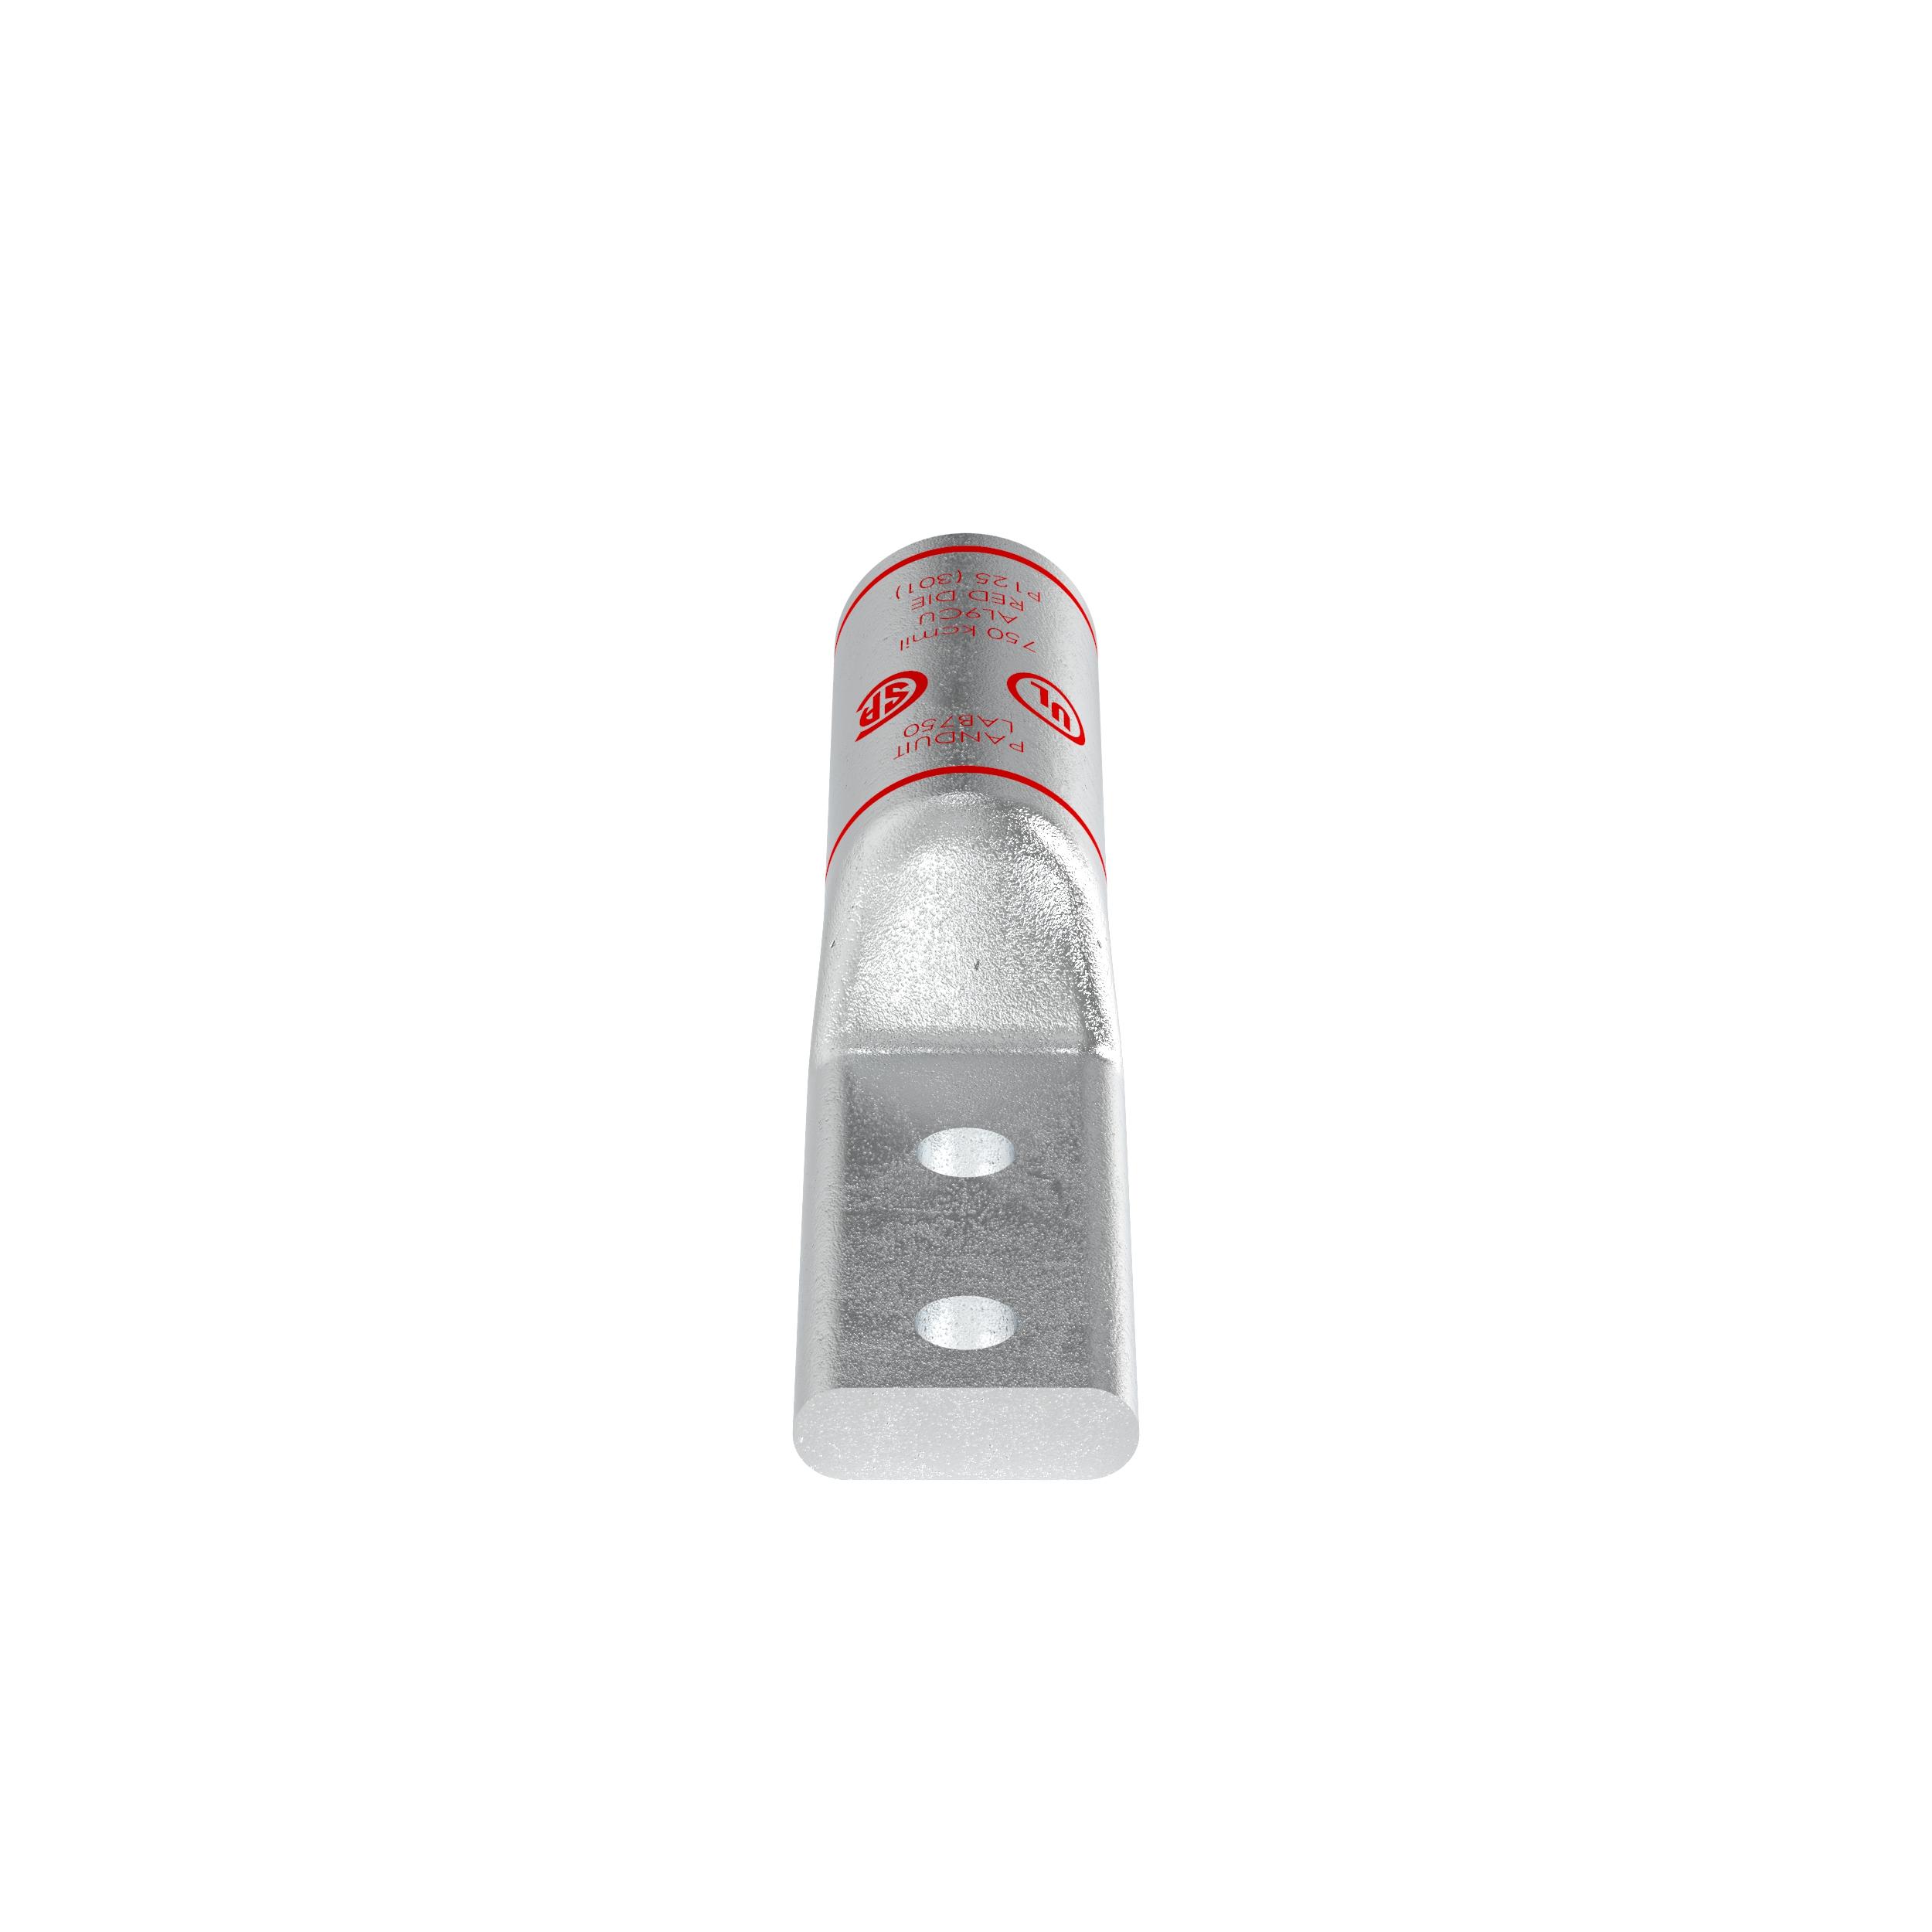 Panduit® LAB750-12-1R